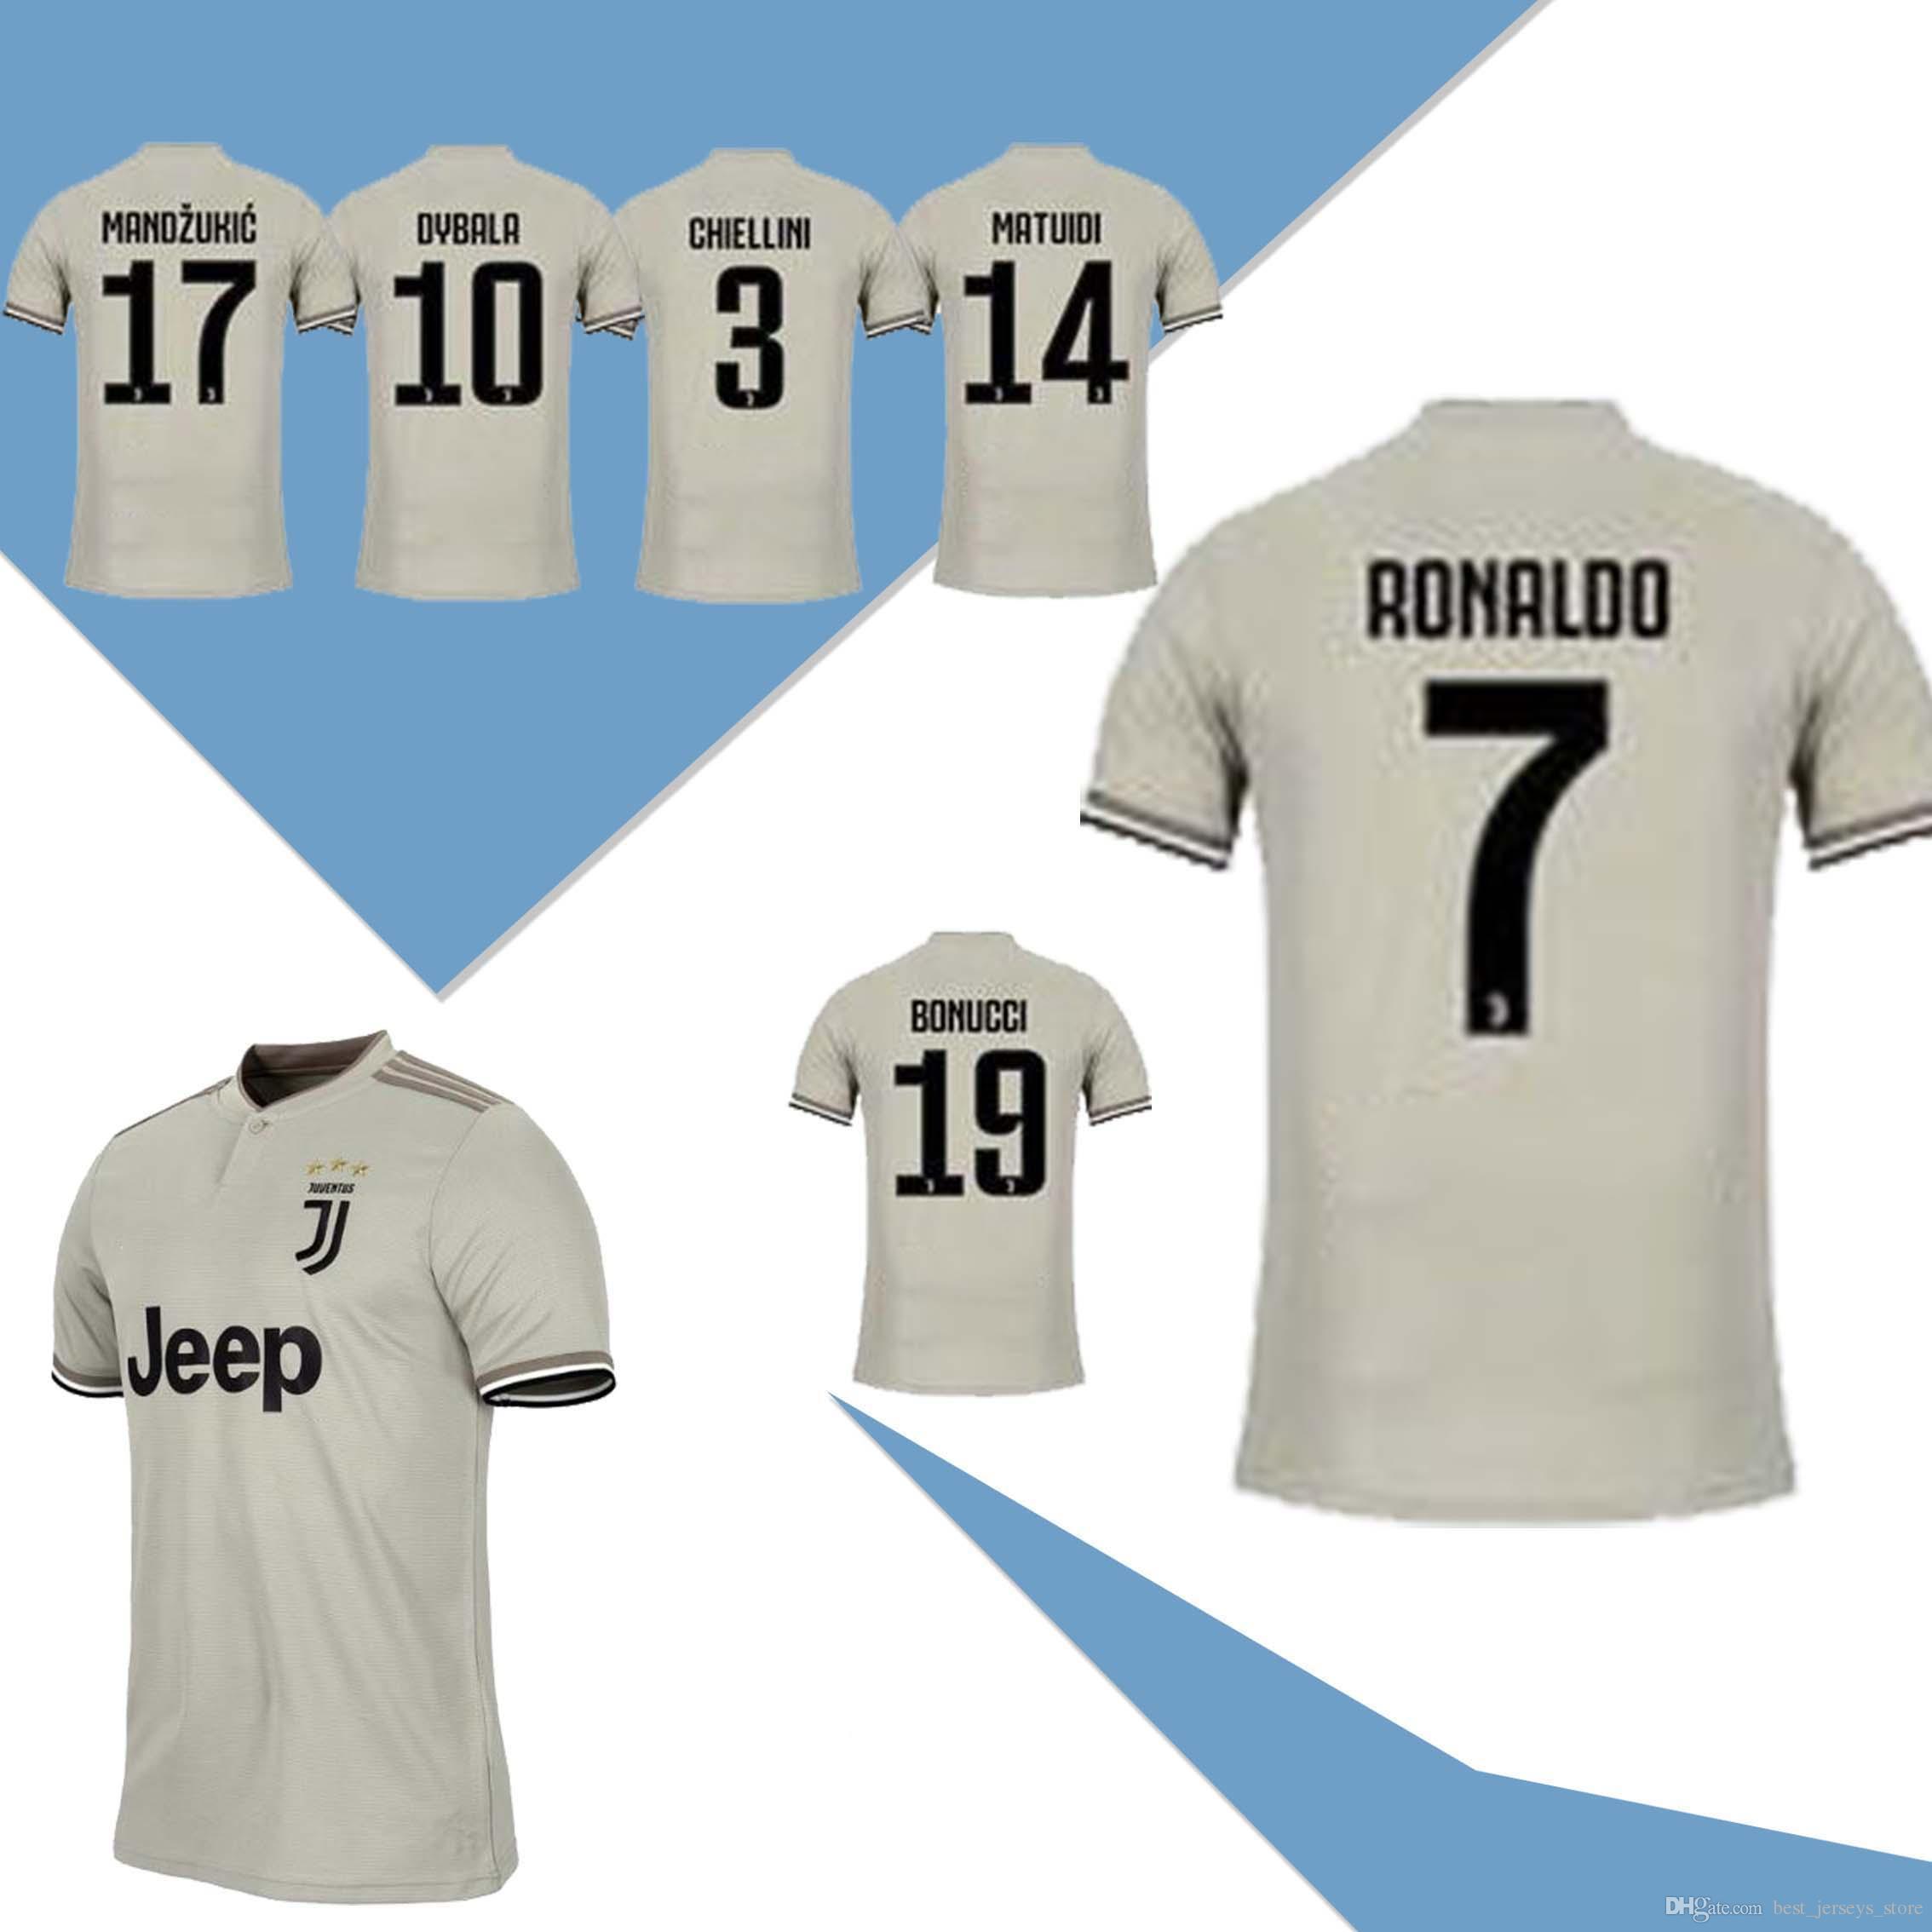 timeless design e3ca7 75287 2019 Juventus away Soccer Jersey 18/19#7 RONALDO DYBALA Soccer Shirt  MARCHISIO MANDZUKIC PJANIC BONUCCI football uniform